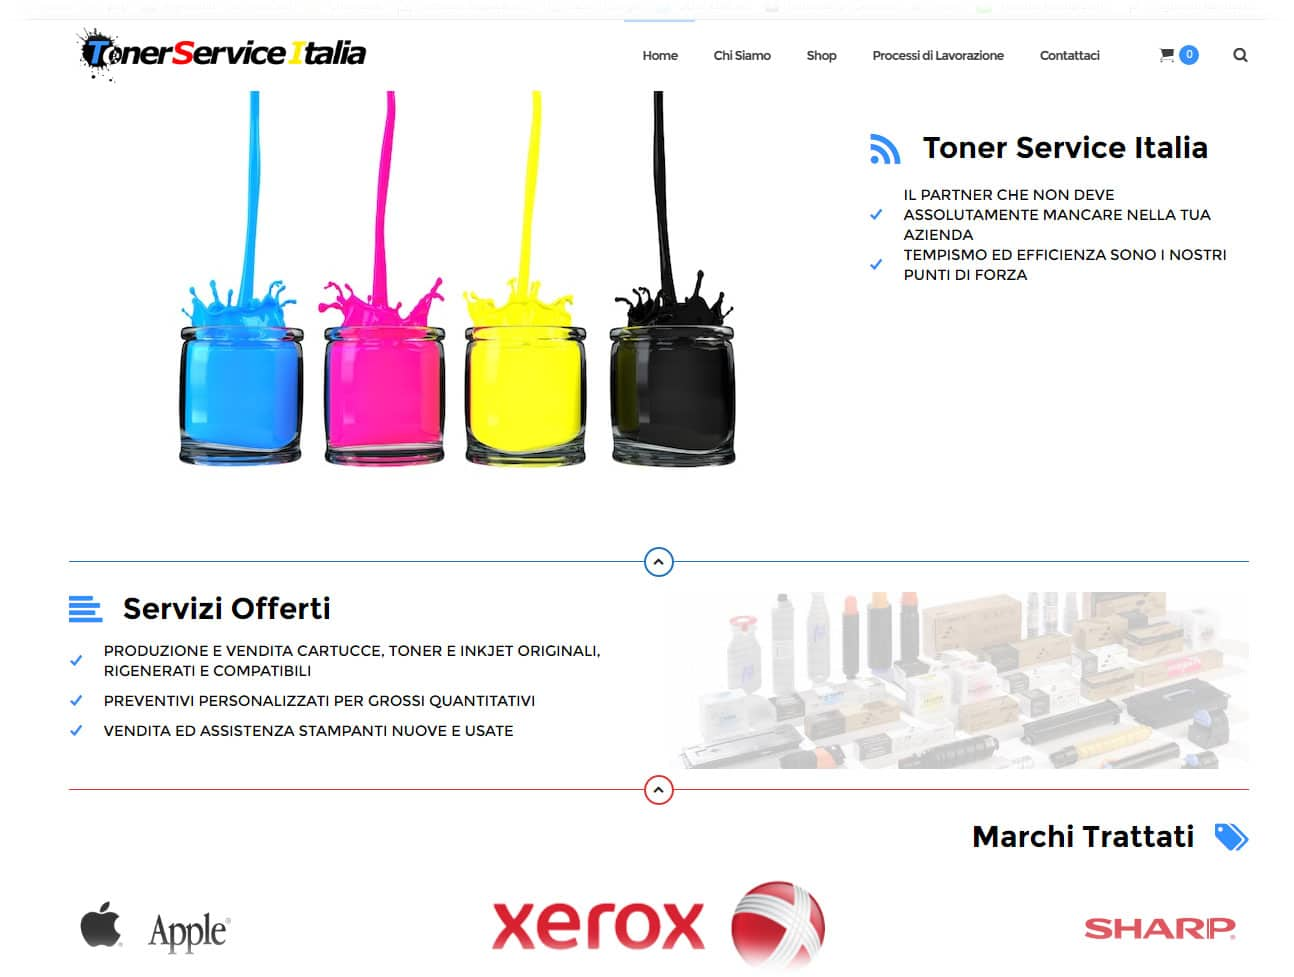 Toner Service Italia